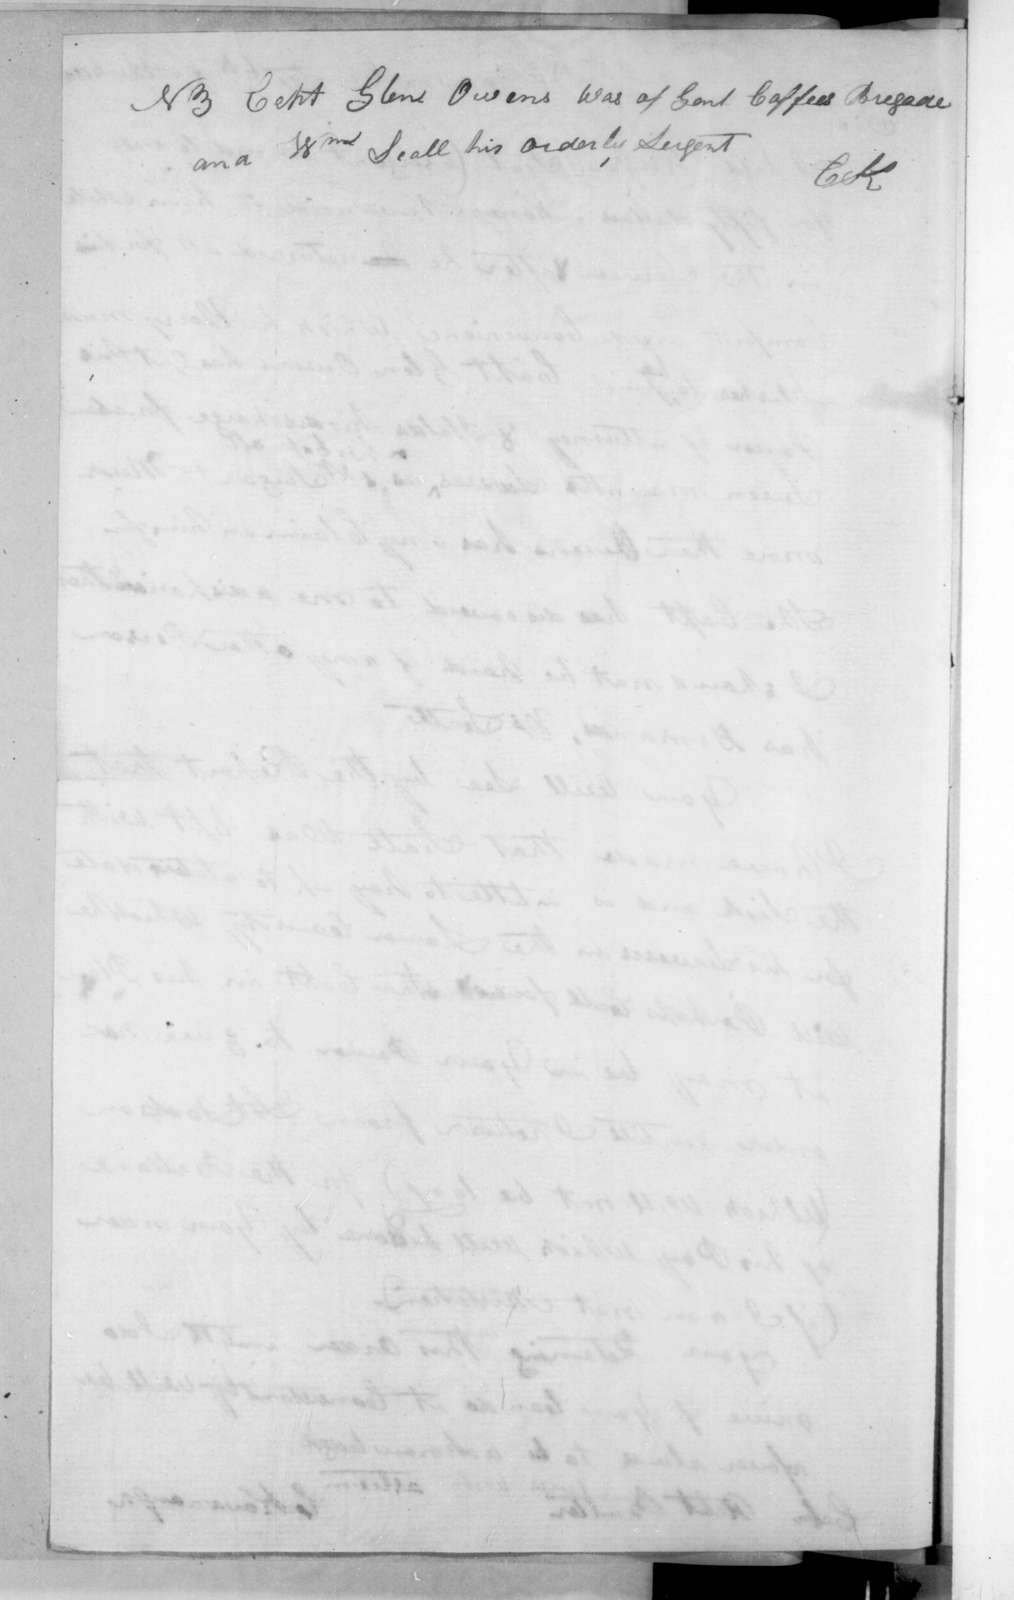 Charles Kavanaugh to Robert Butler, April 6, 1816